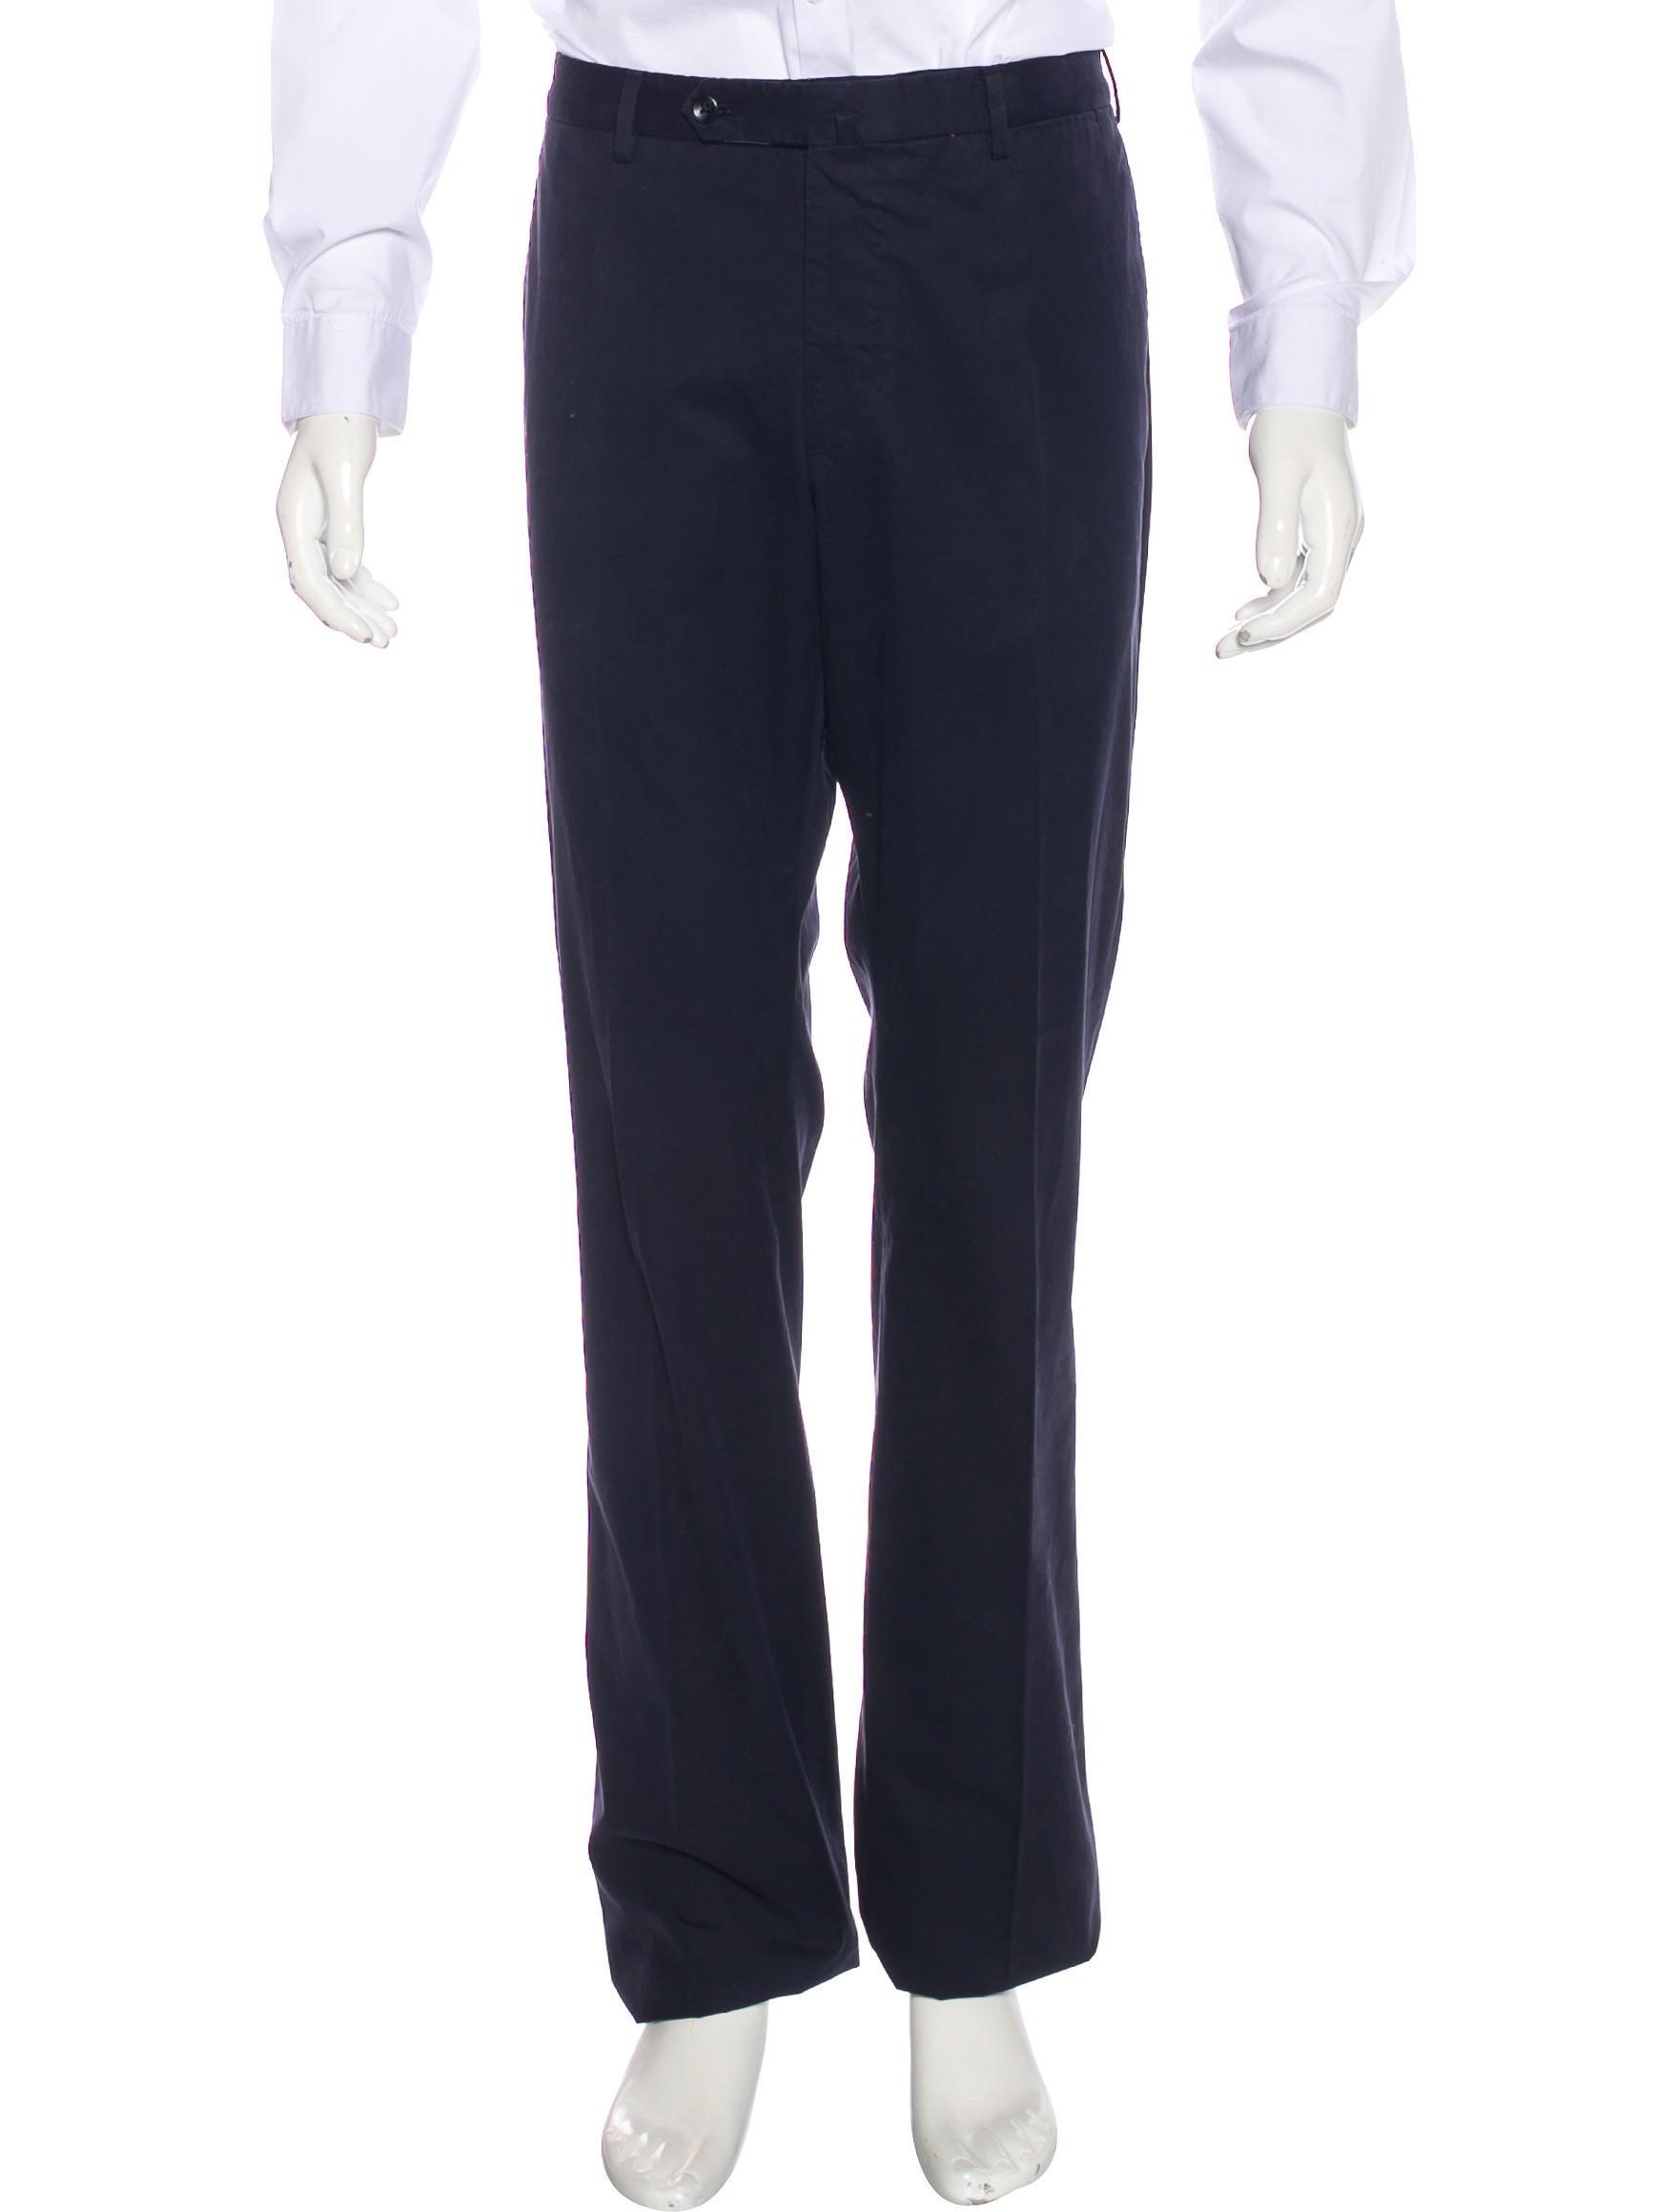 Incotex woven dress pants w tags clothing wincx20225 Woven t shirt tags